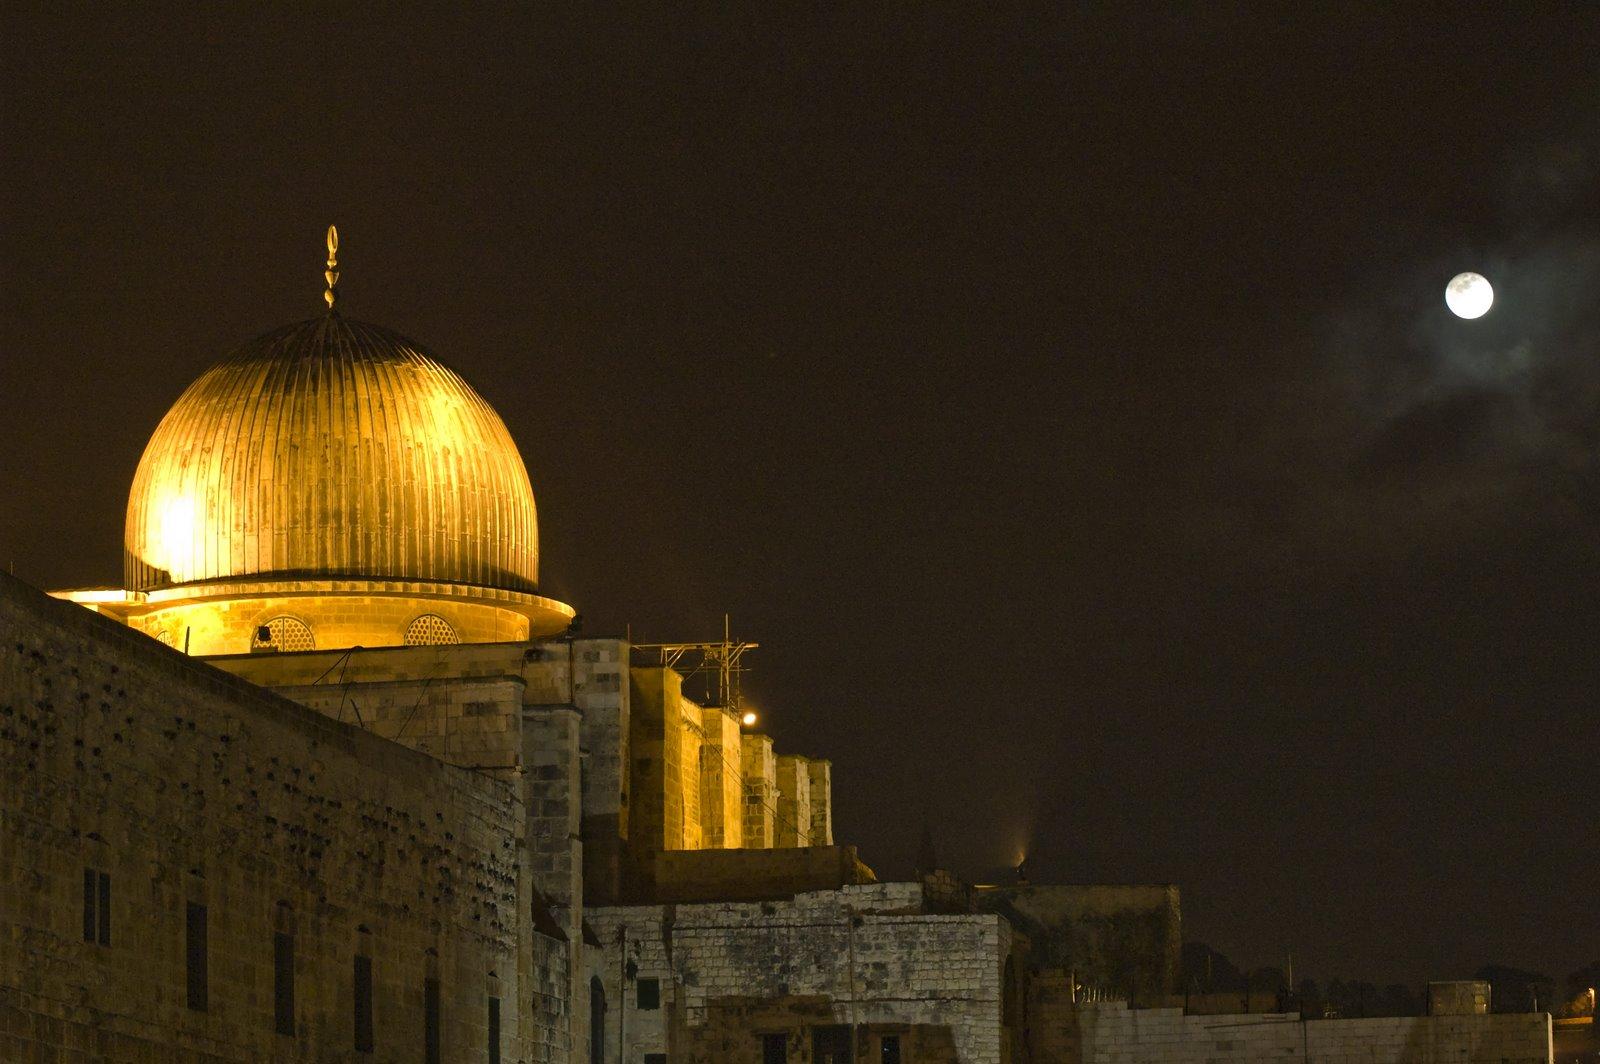 Jerusalem | SEASONSALI: https://seasonsali.wordpress.com/2010/12/01/2017/